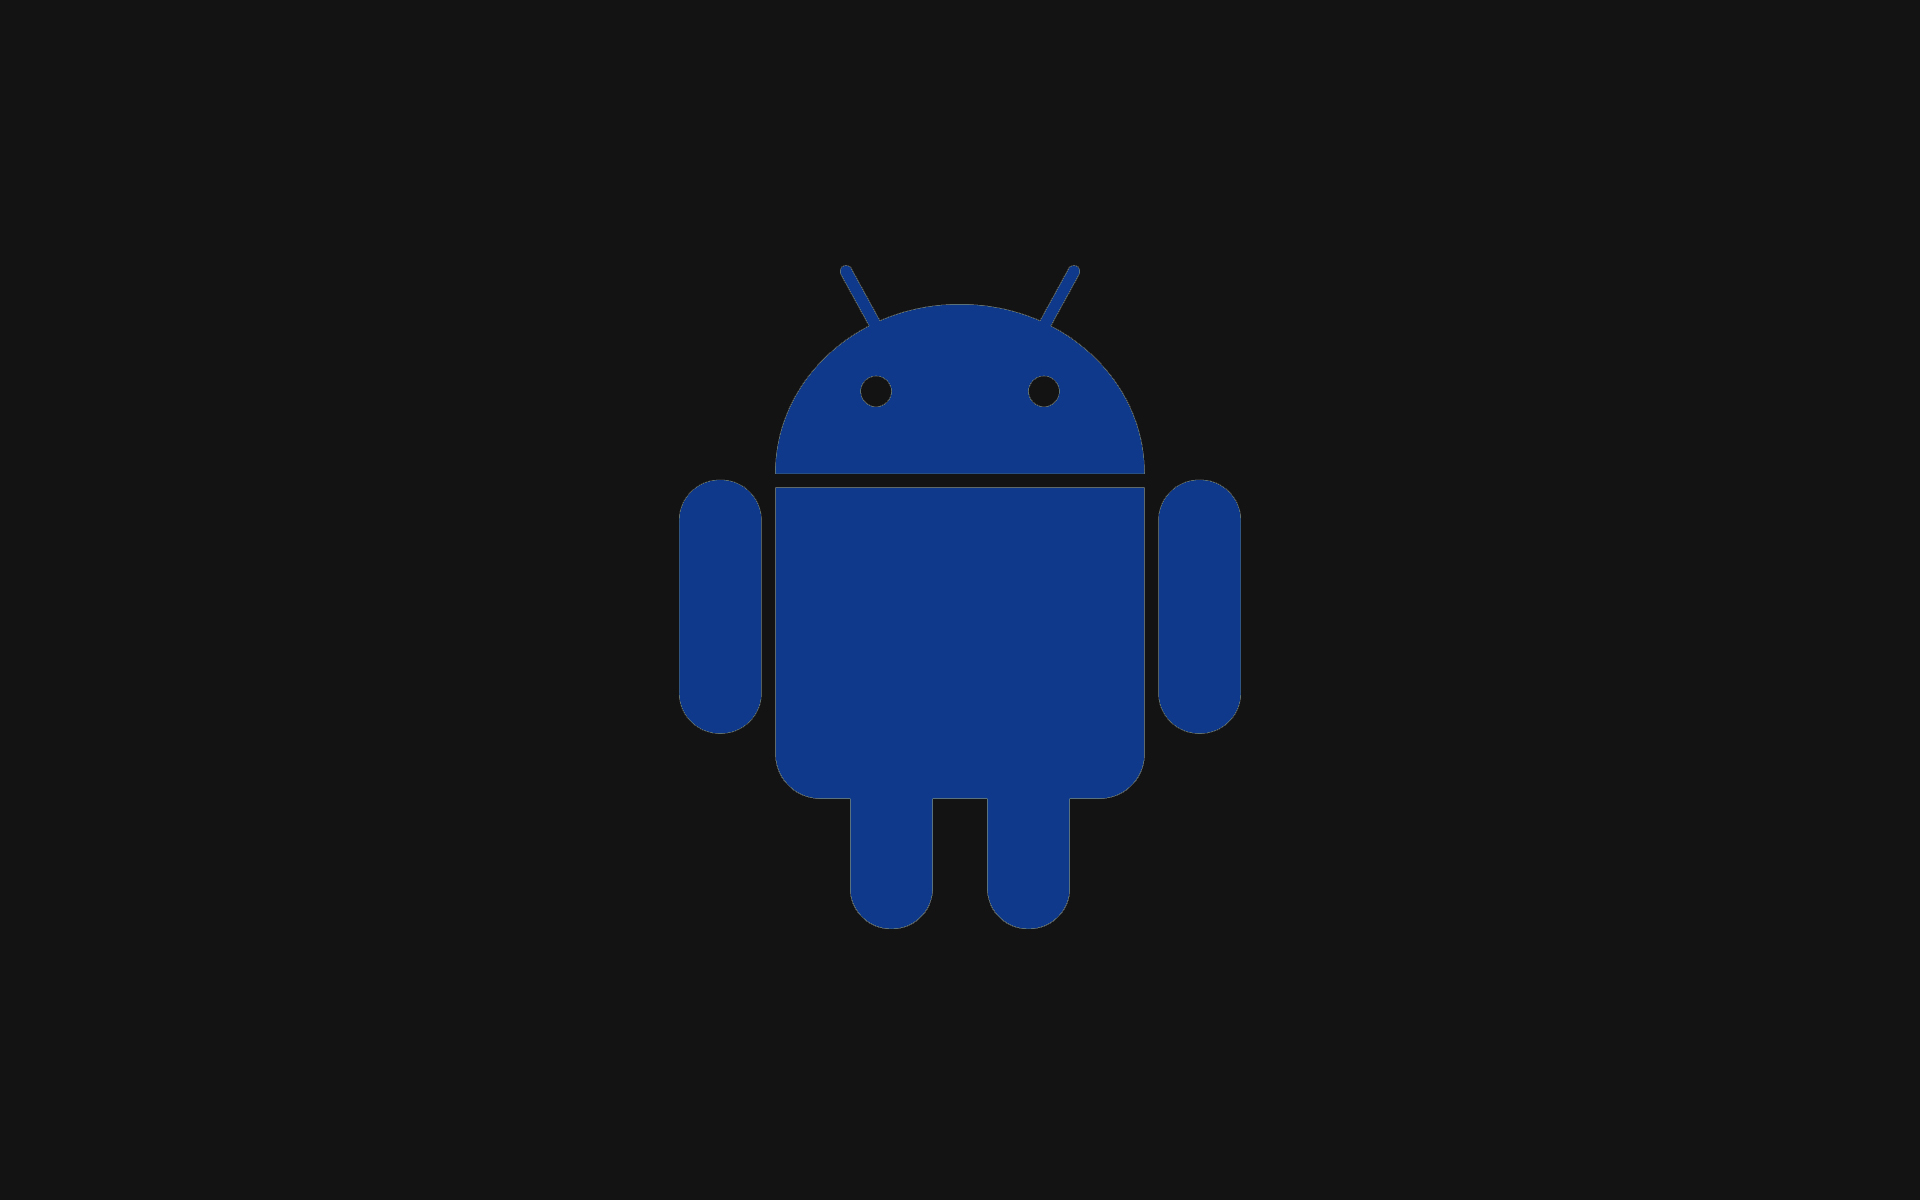 Seattle Iphone X Wallpaper Android Logo Wallpapers Hd Pixelstalk Net